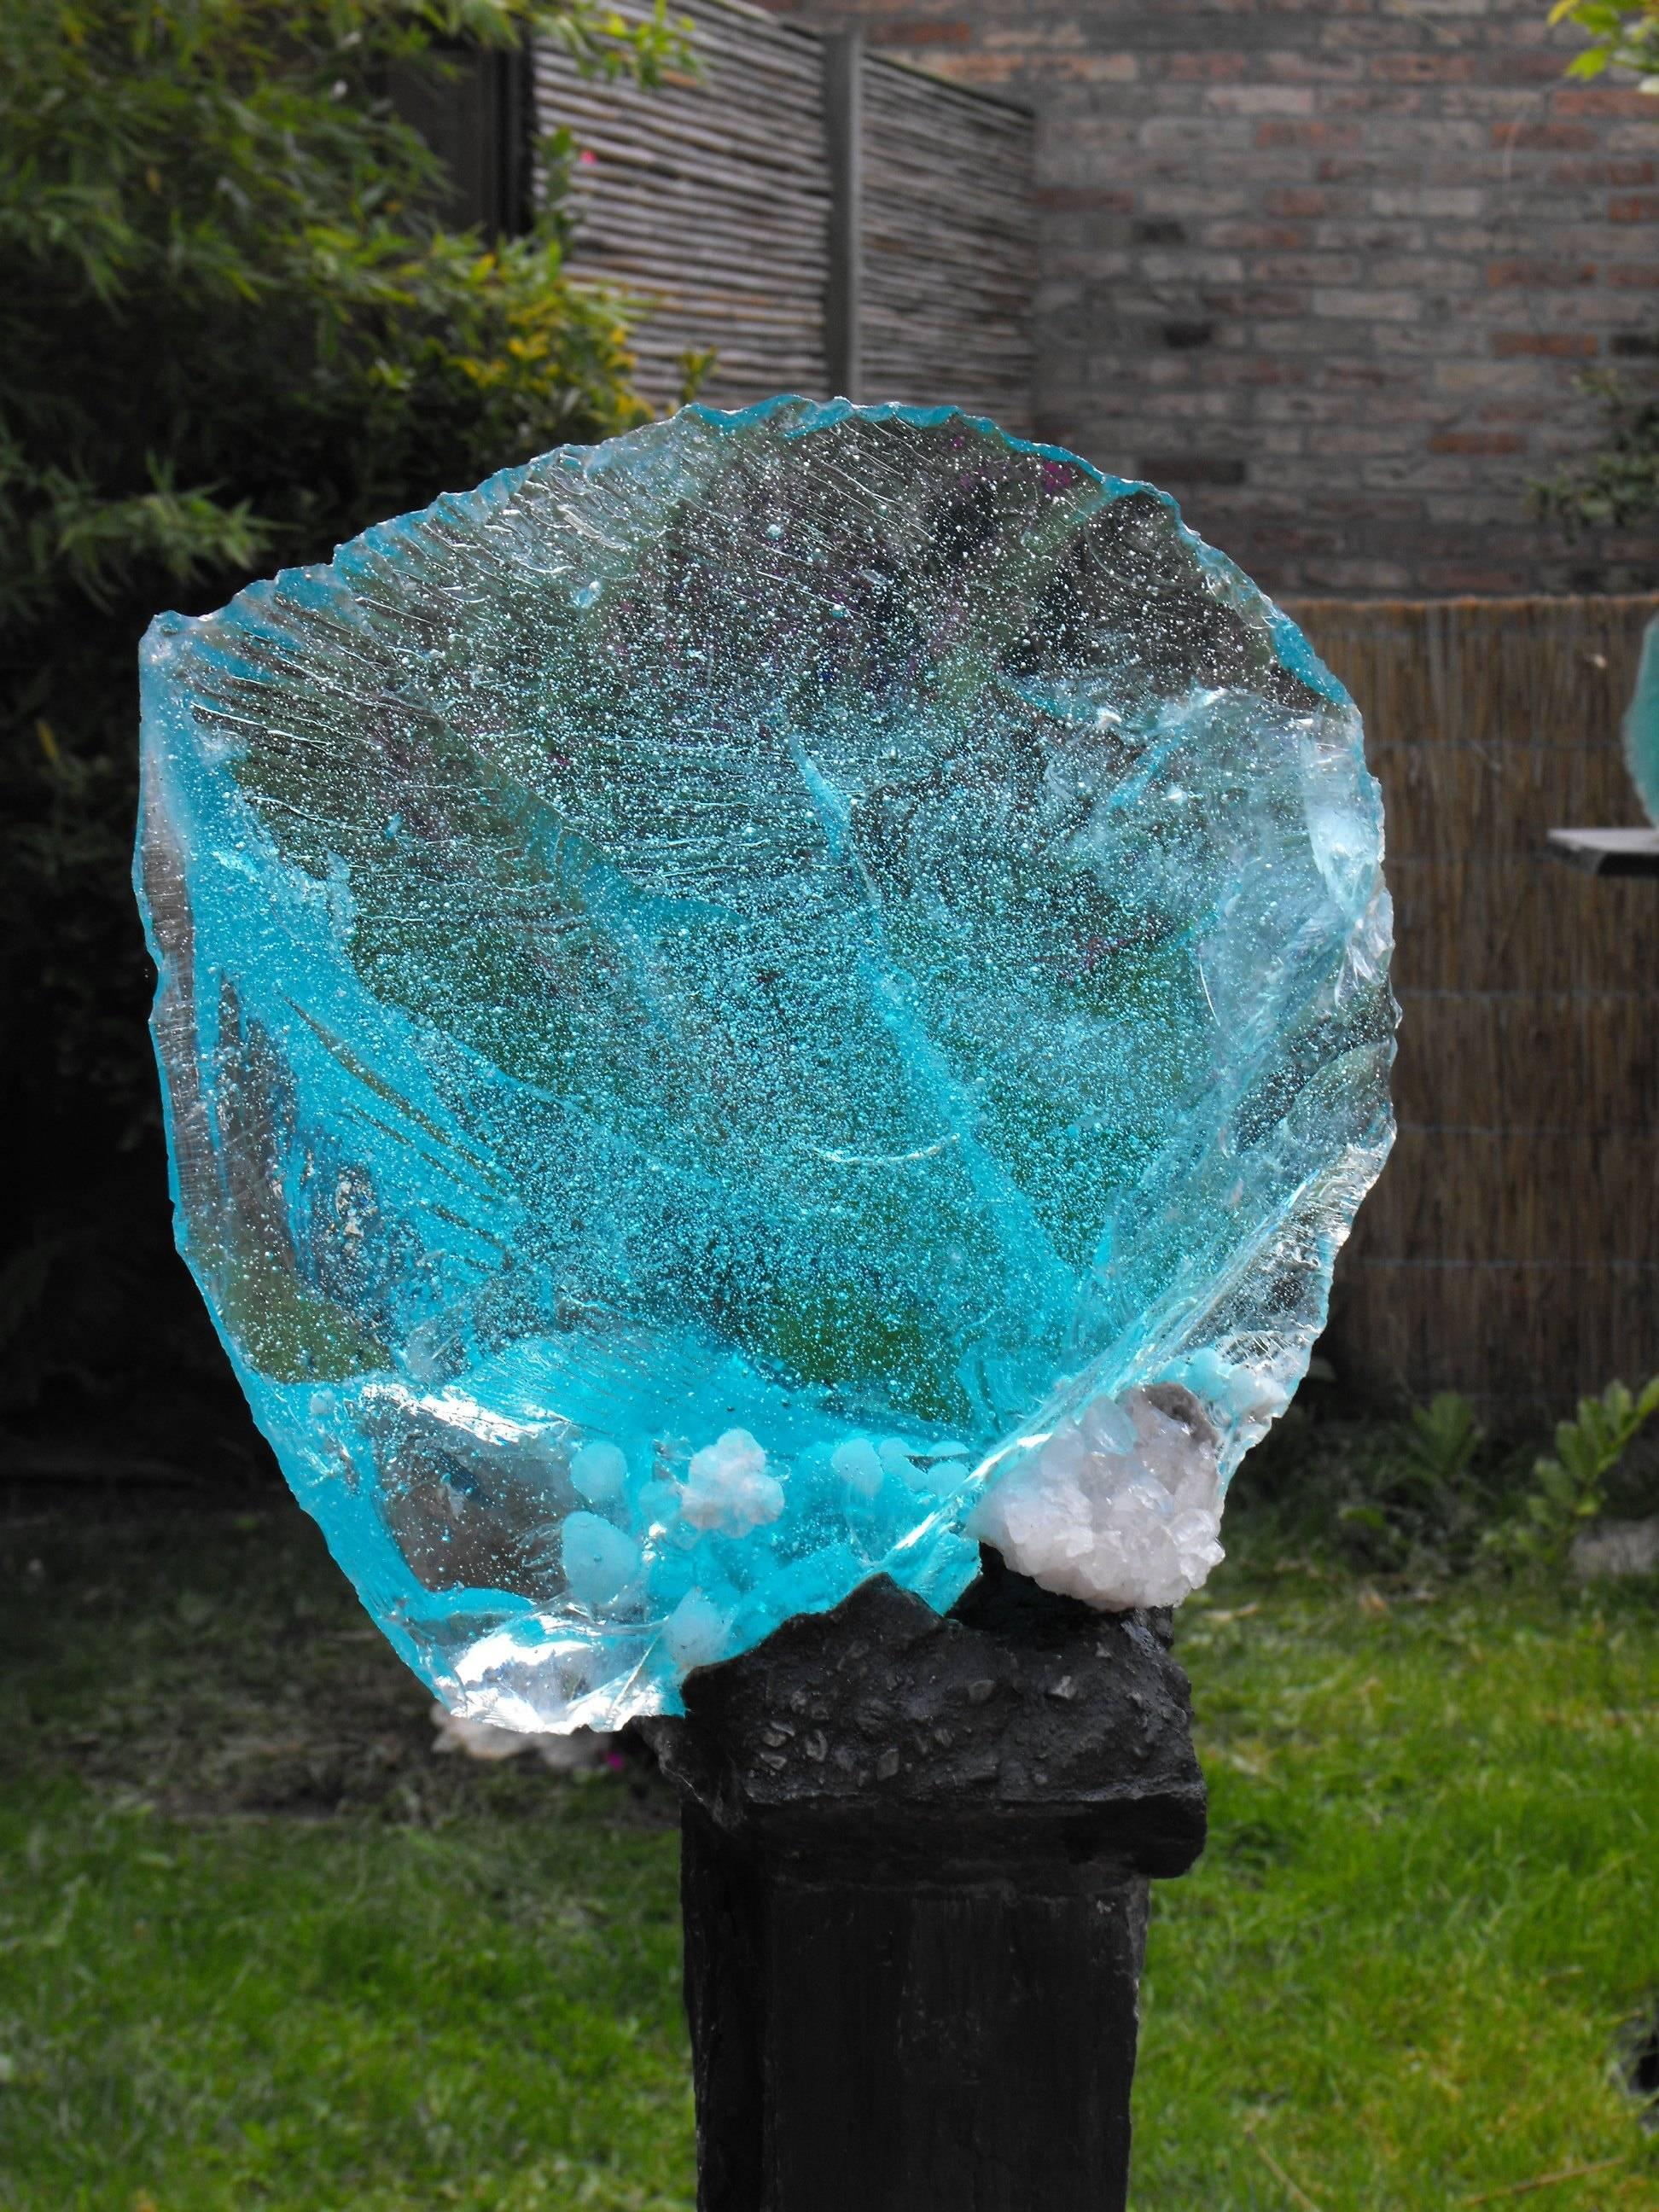 010-A_Leisteen_Glas_Kristal